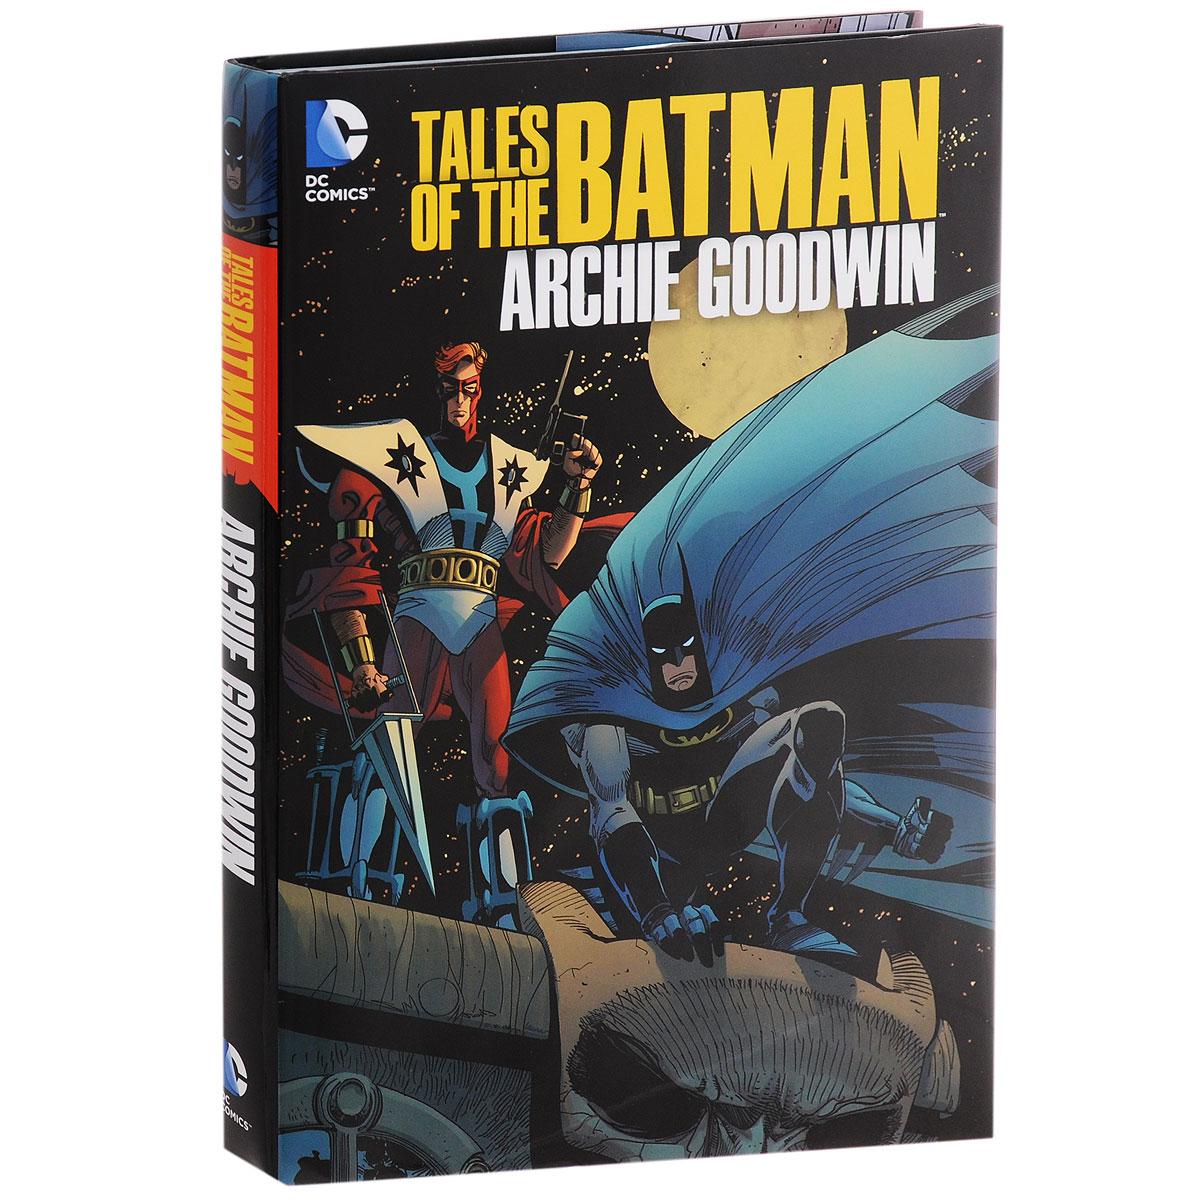 Tales of the Batman: Archie Goodwin tales of the batman